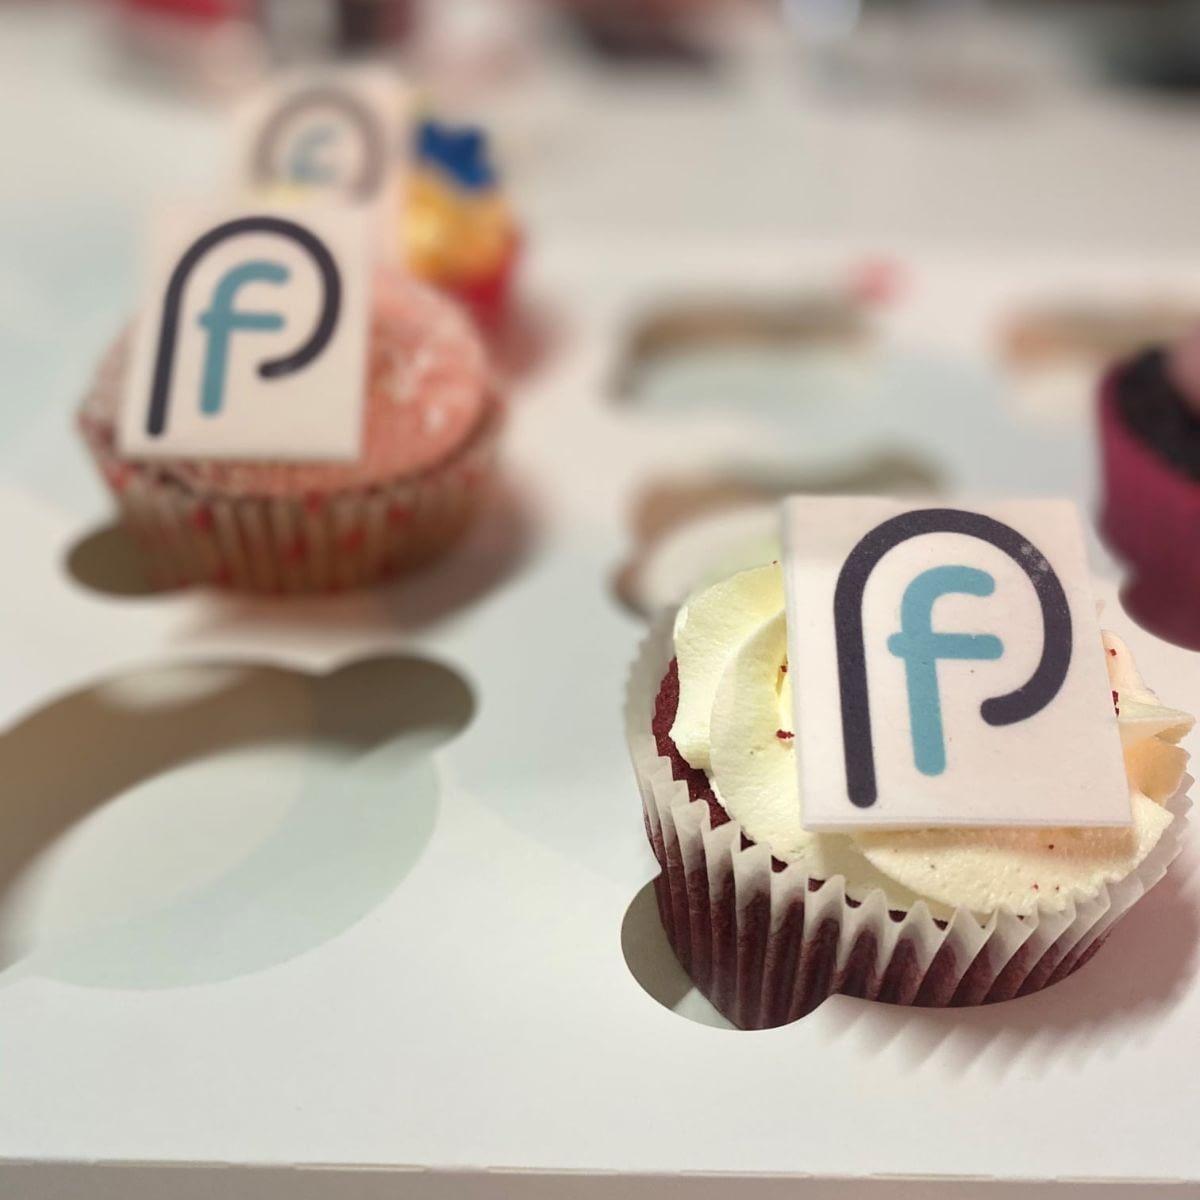 Fraser People cupcake